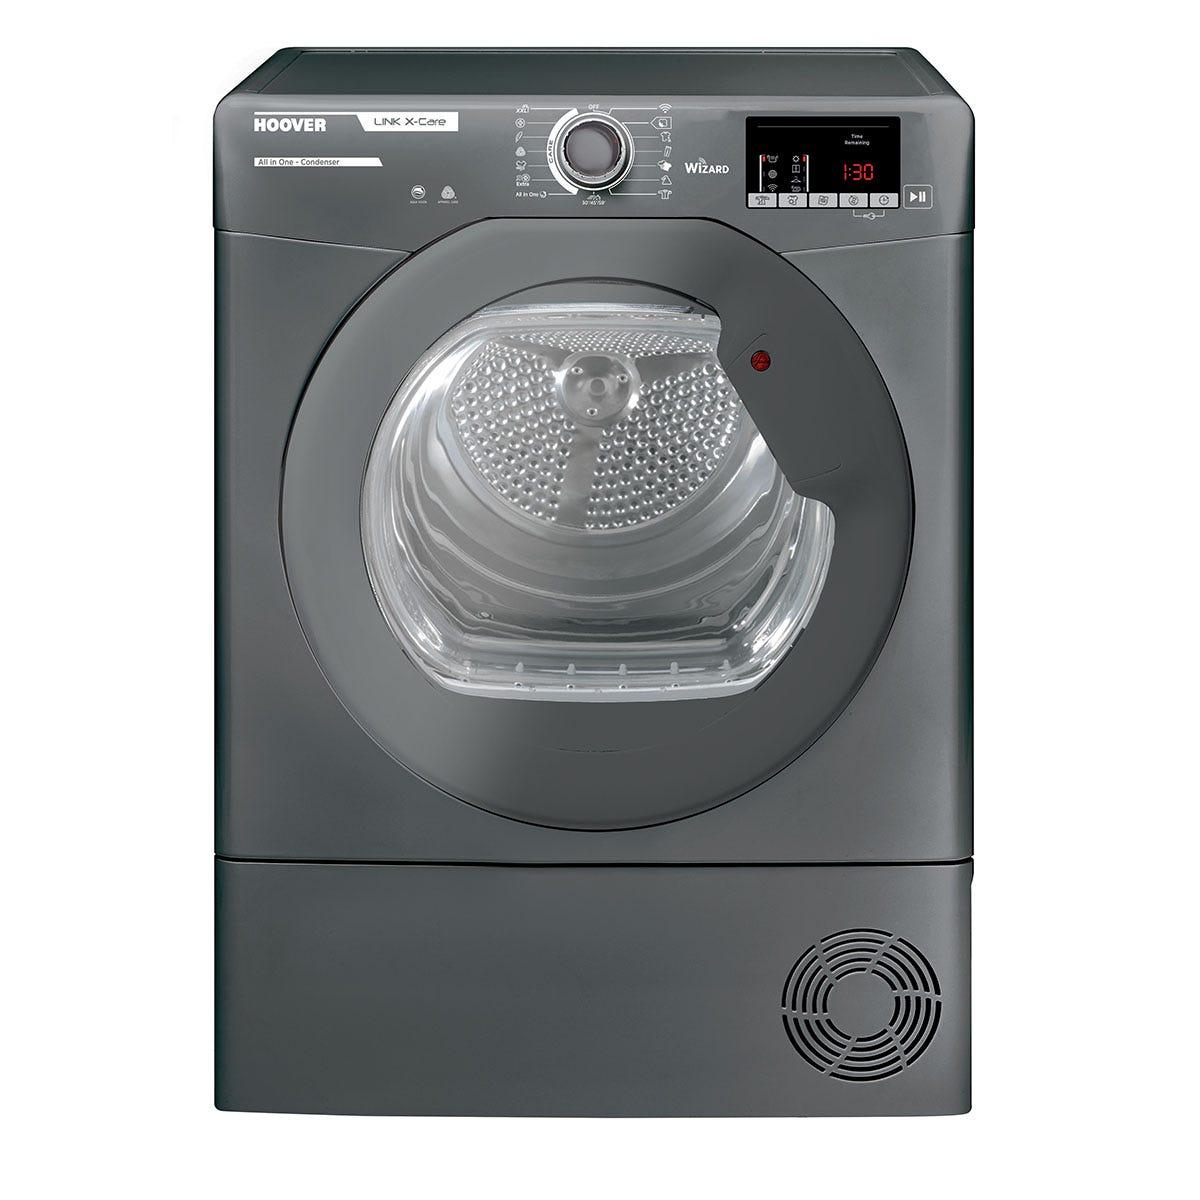 Hoover HLXC9DRGR 9kg Smart Wifi-enabled Condenser Tumble Dryer - Graphite